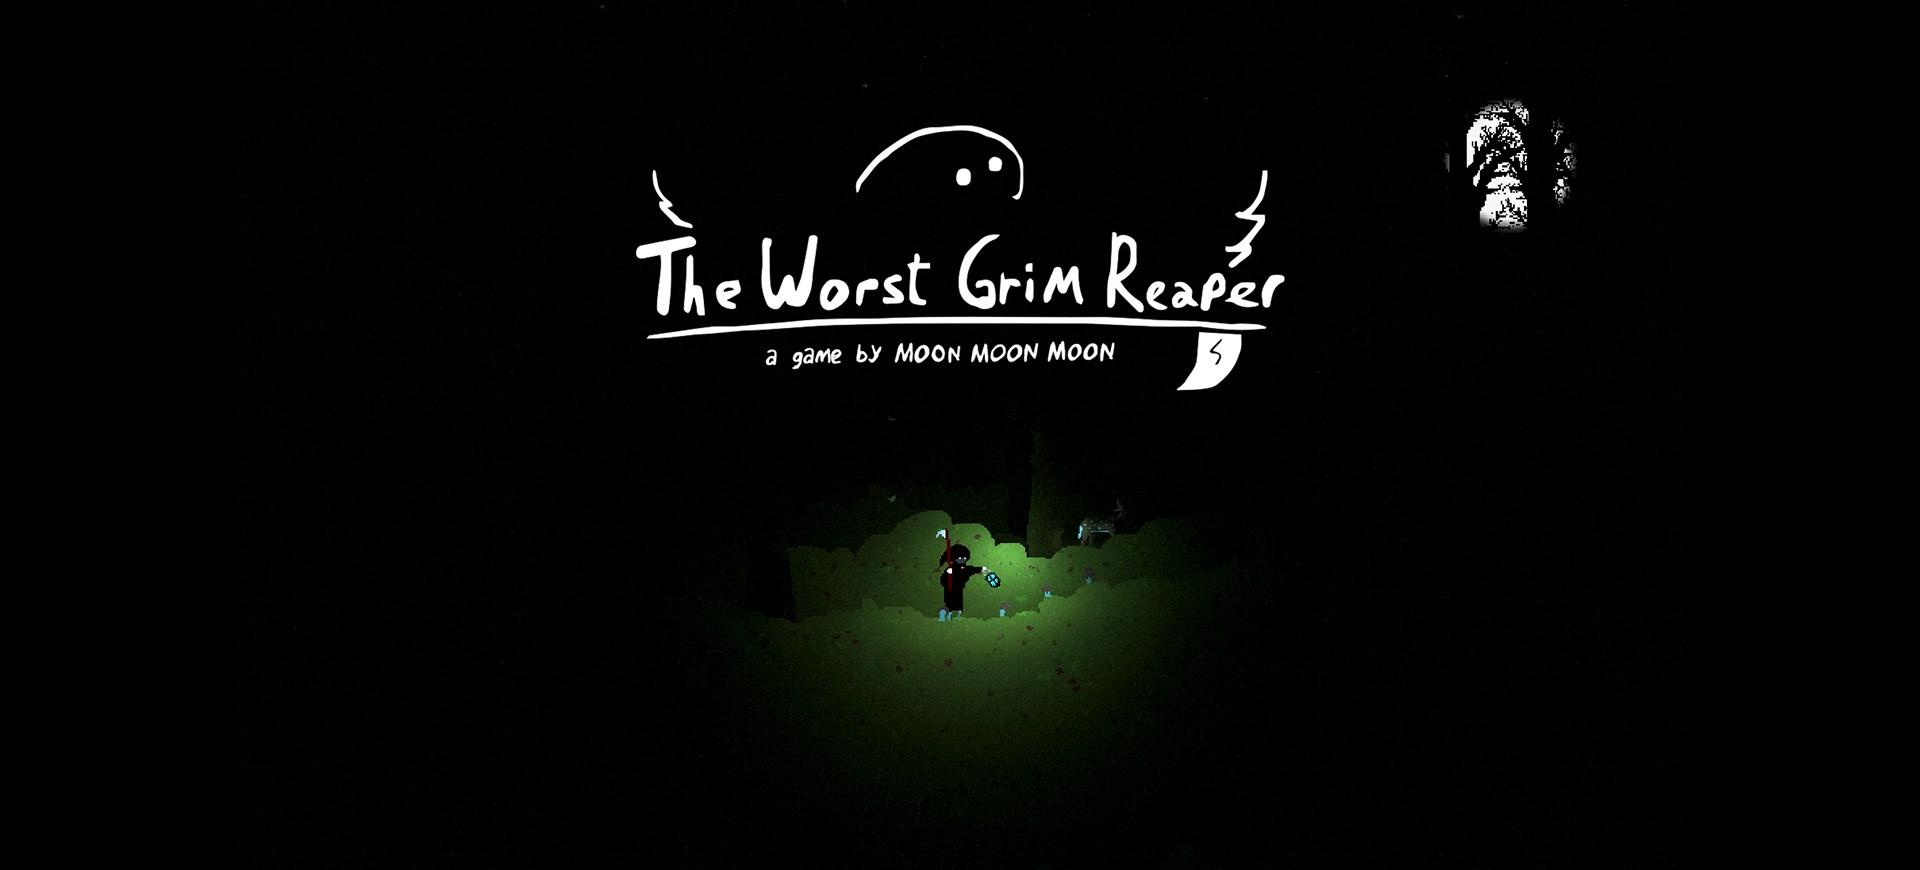 The Worst Grim Reaper